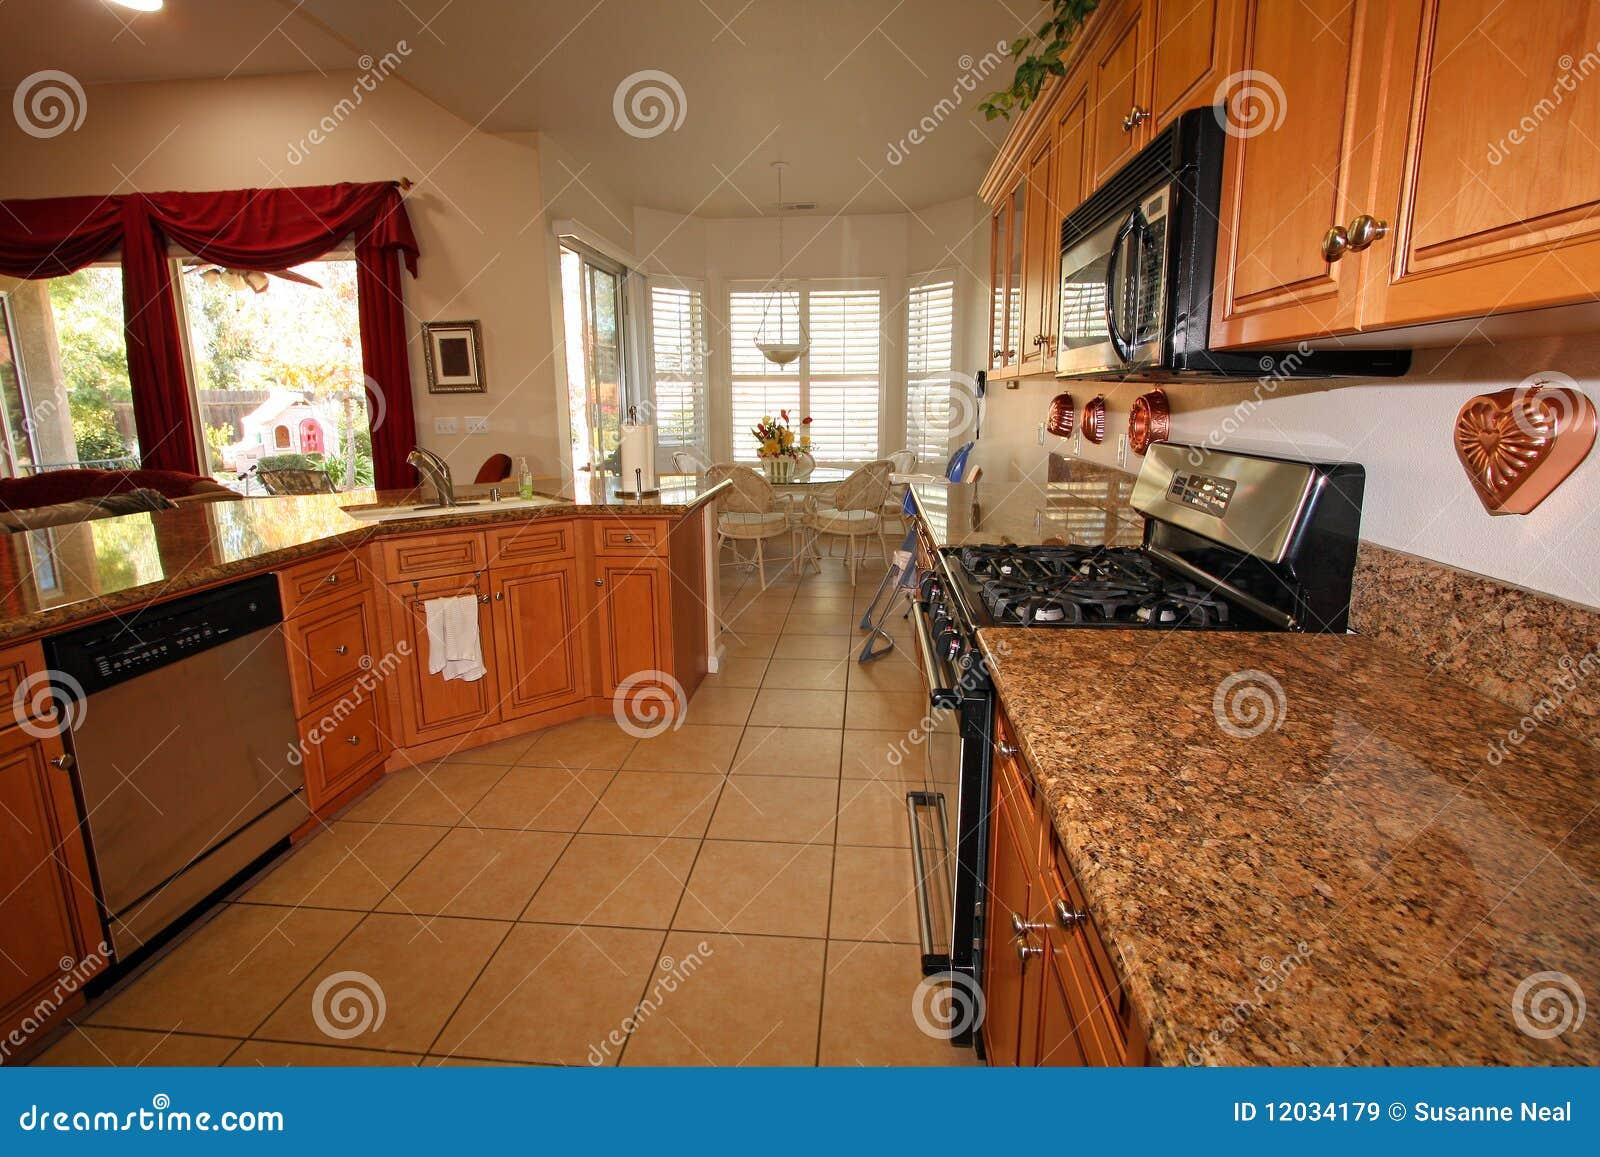 Cucina e sala da pranzo moderne immagine stock immagine for Cucina con sala da pranzo